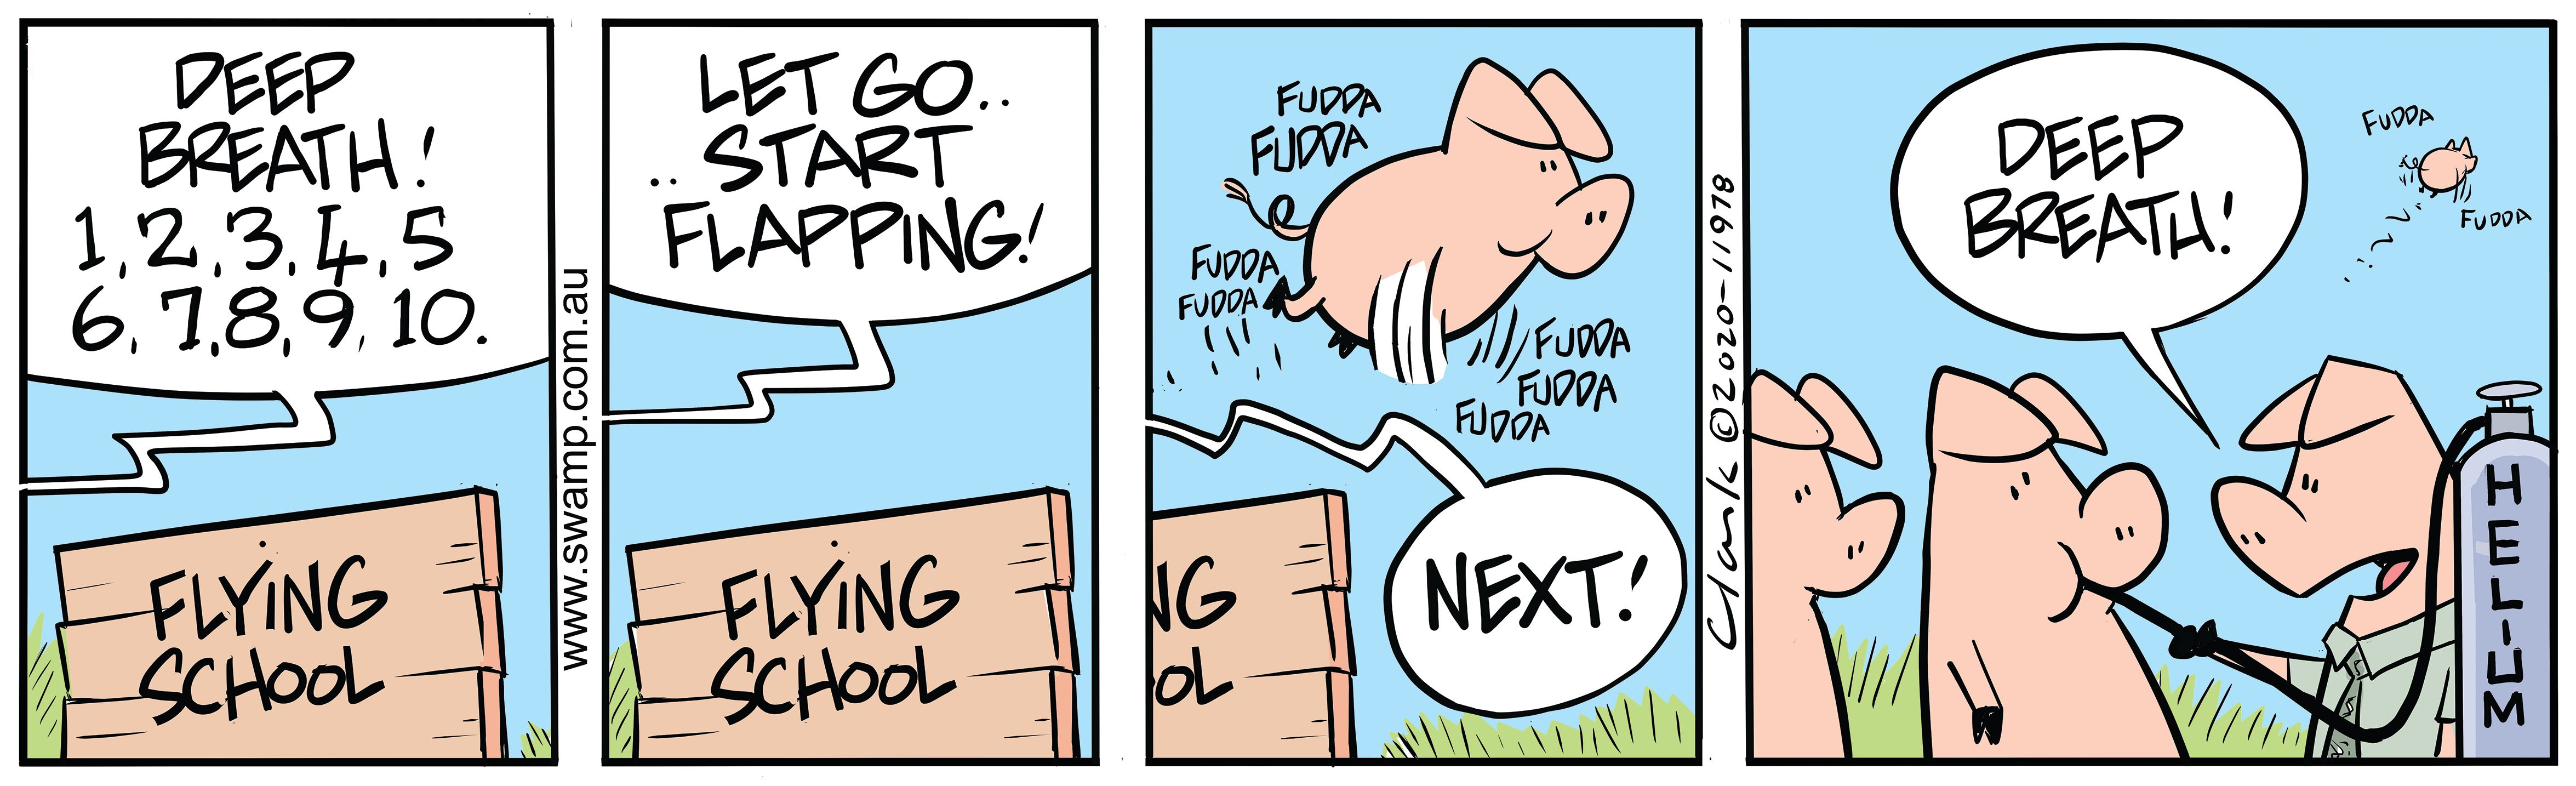 Pigs Need Deep Breath